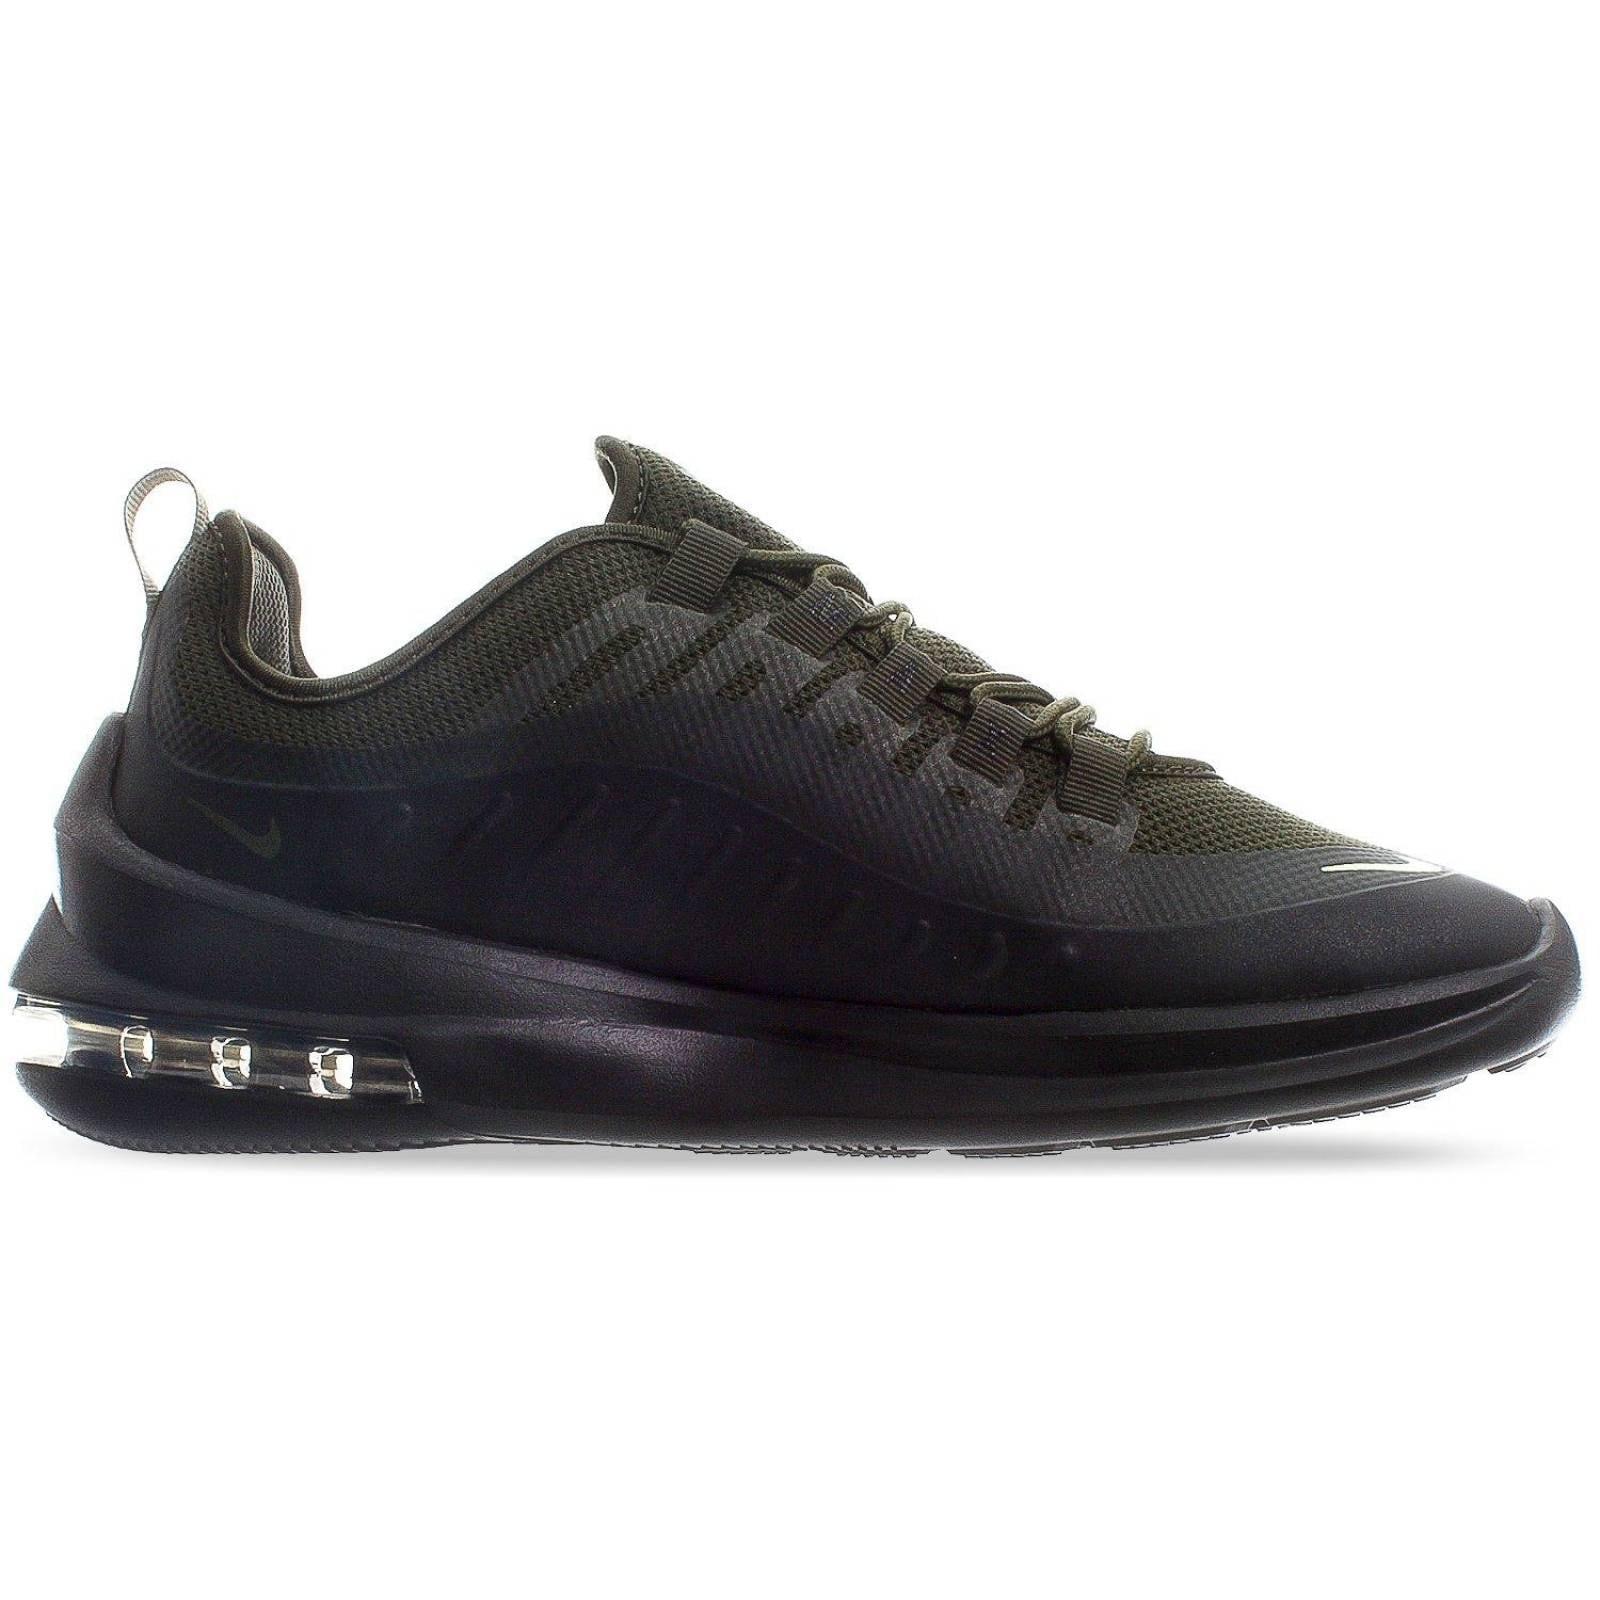 Implacable Cornualles de madera  Tenis Nike Air Max Axis - AA2146302 - Verde Oliva - Hombre